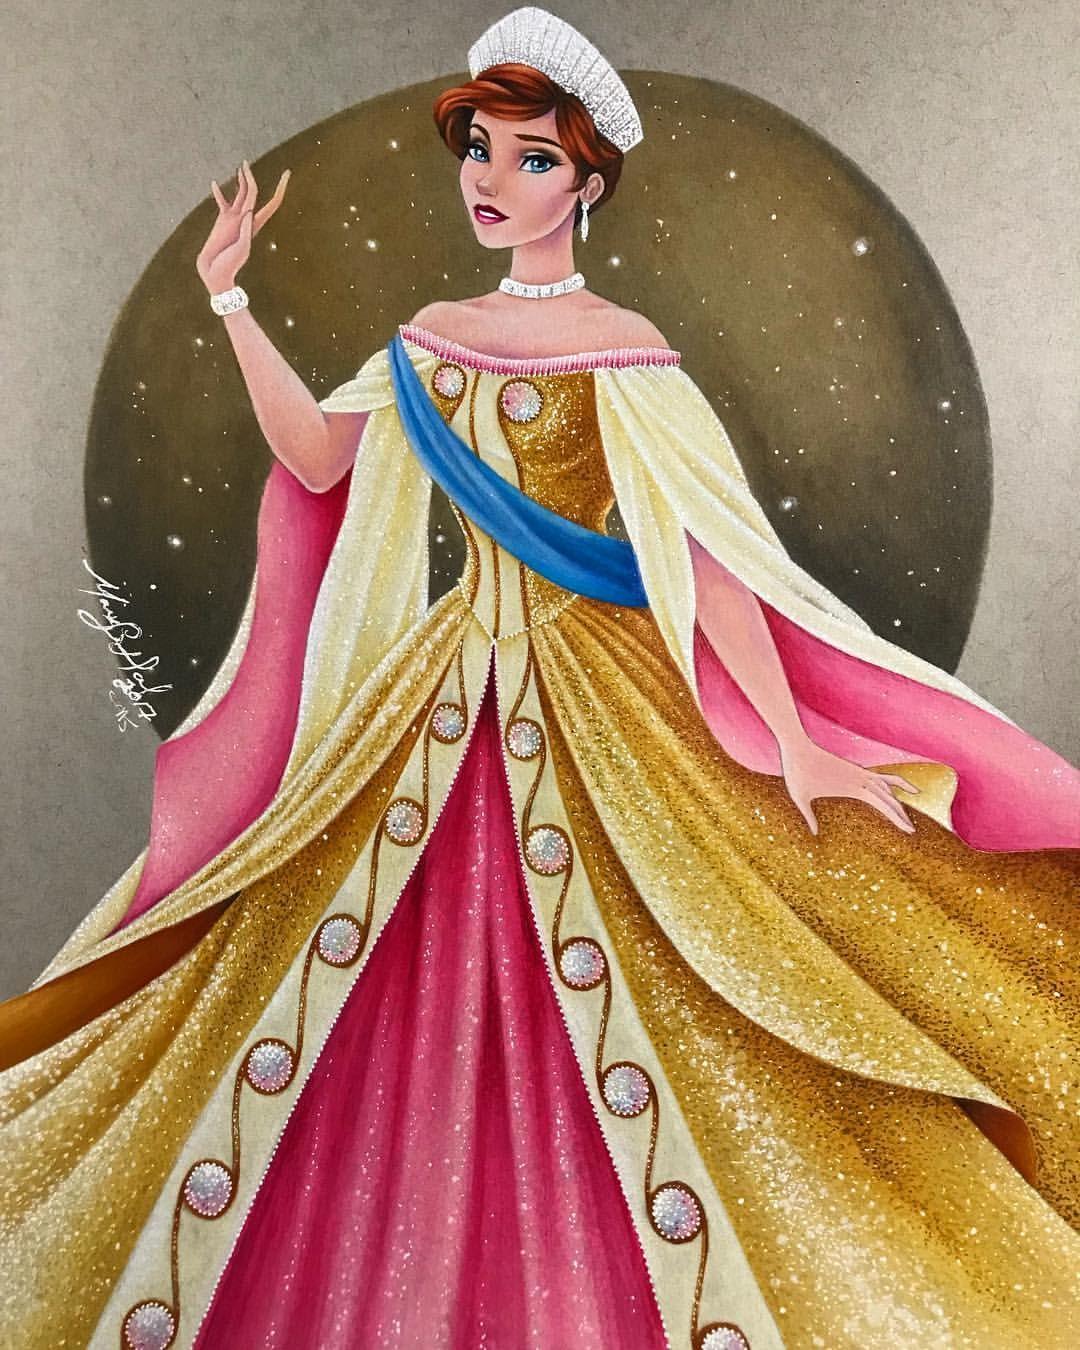 Anastasia by max stephen disney art by max stephen - Peinture princesse disney ...